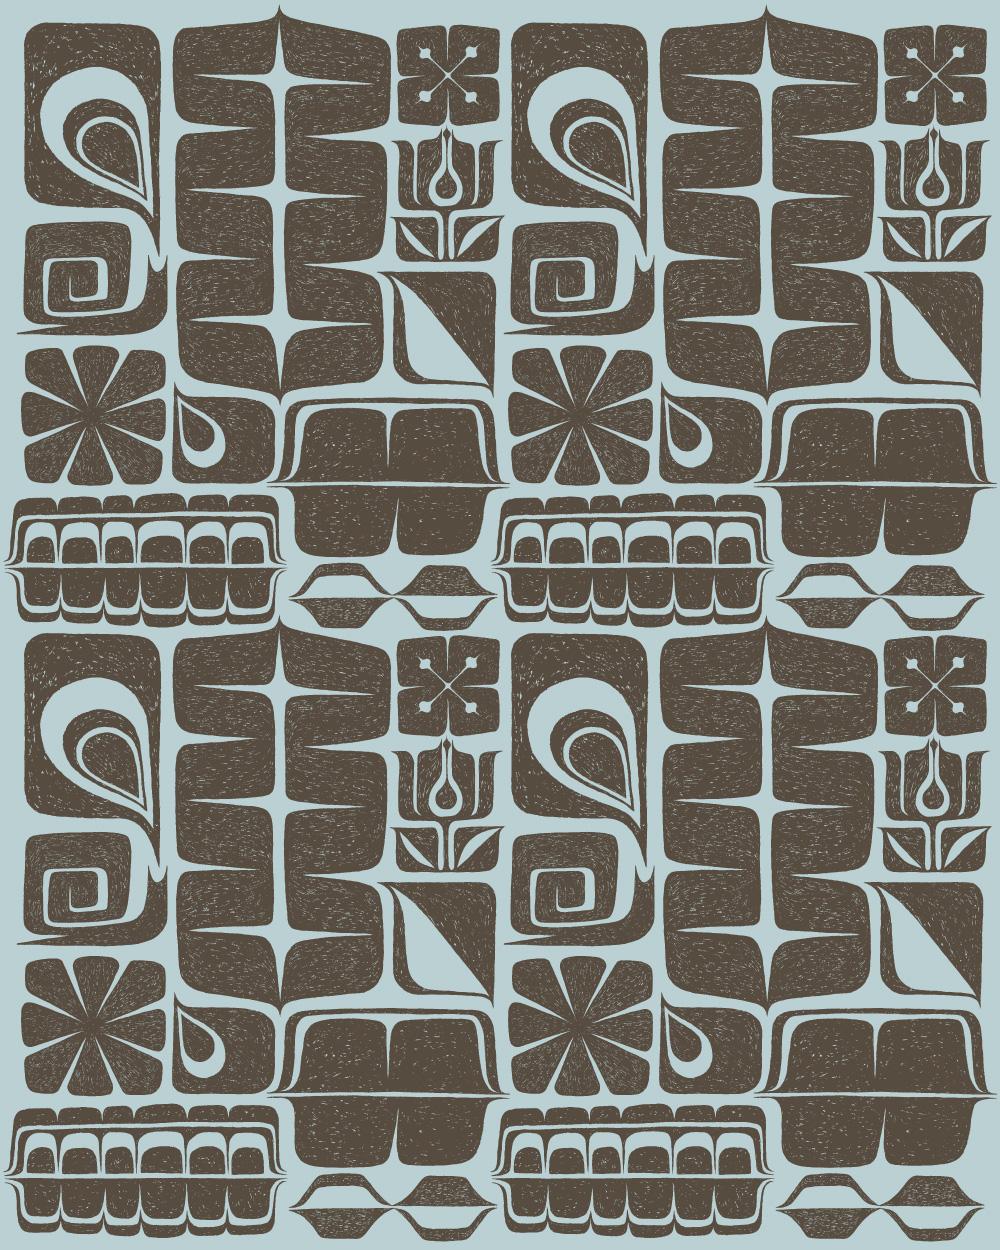 Lisa Lounge GeoTribal Repeat Pattern